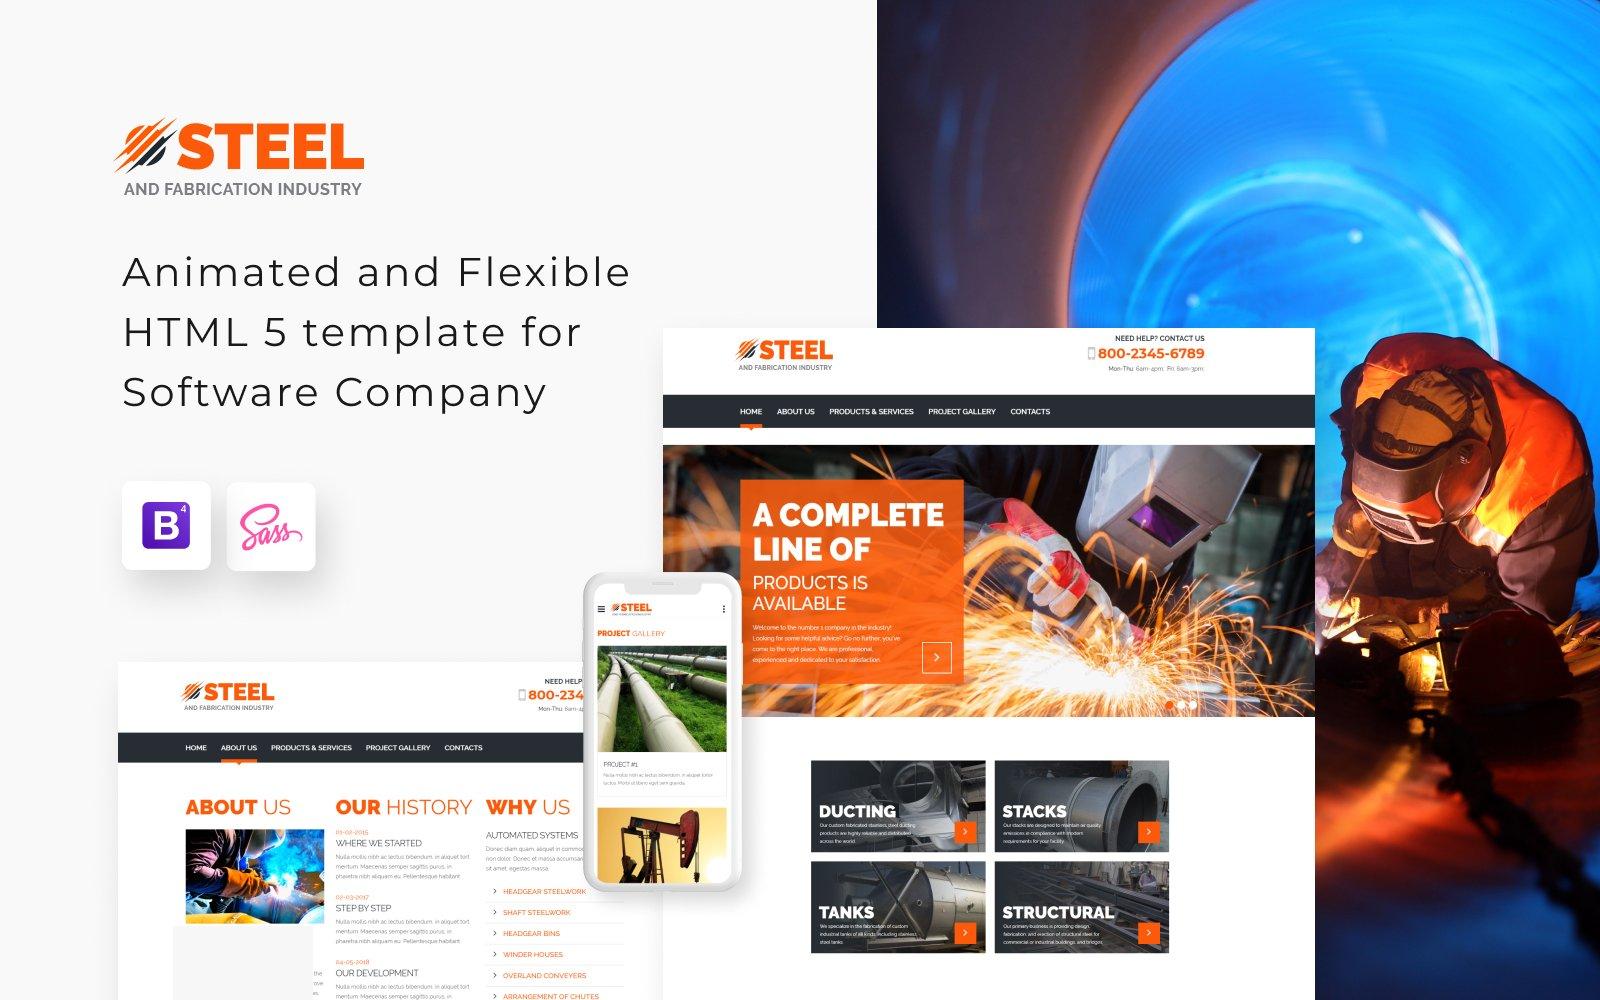 Steel - Metal Fabrication Industry Website Template - screenshot